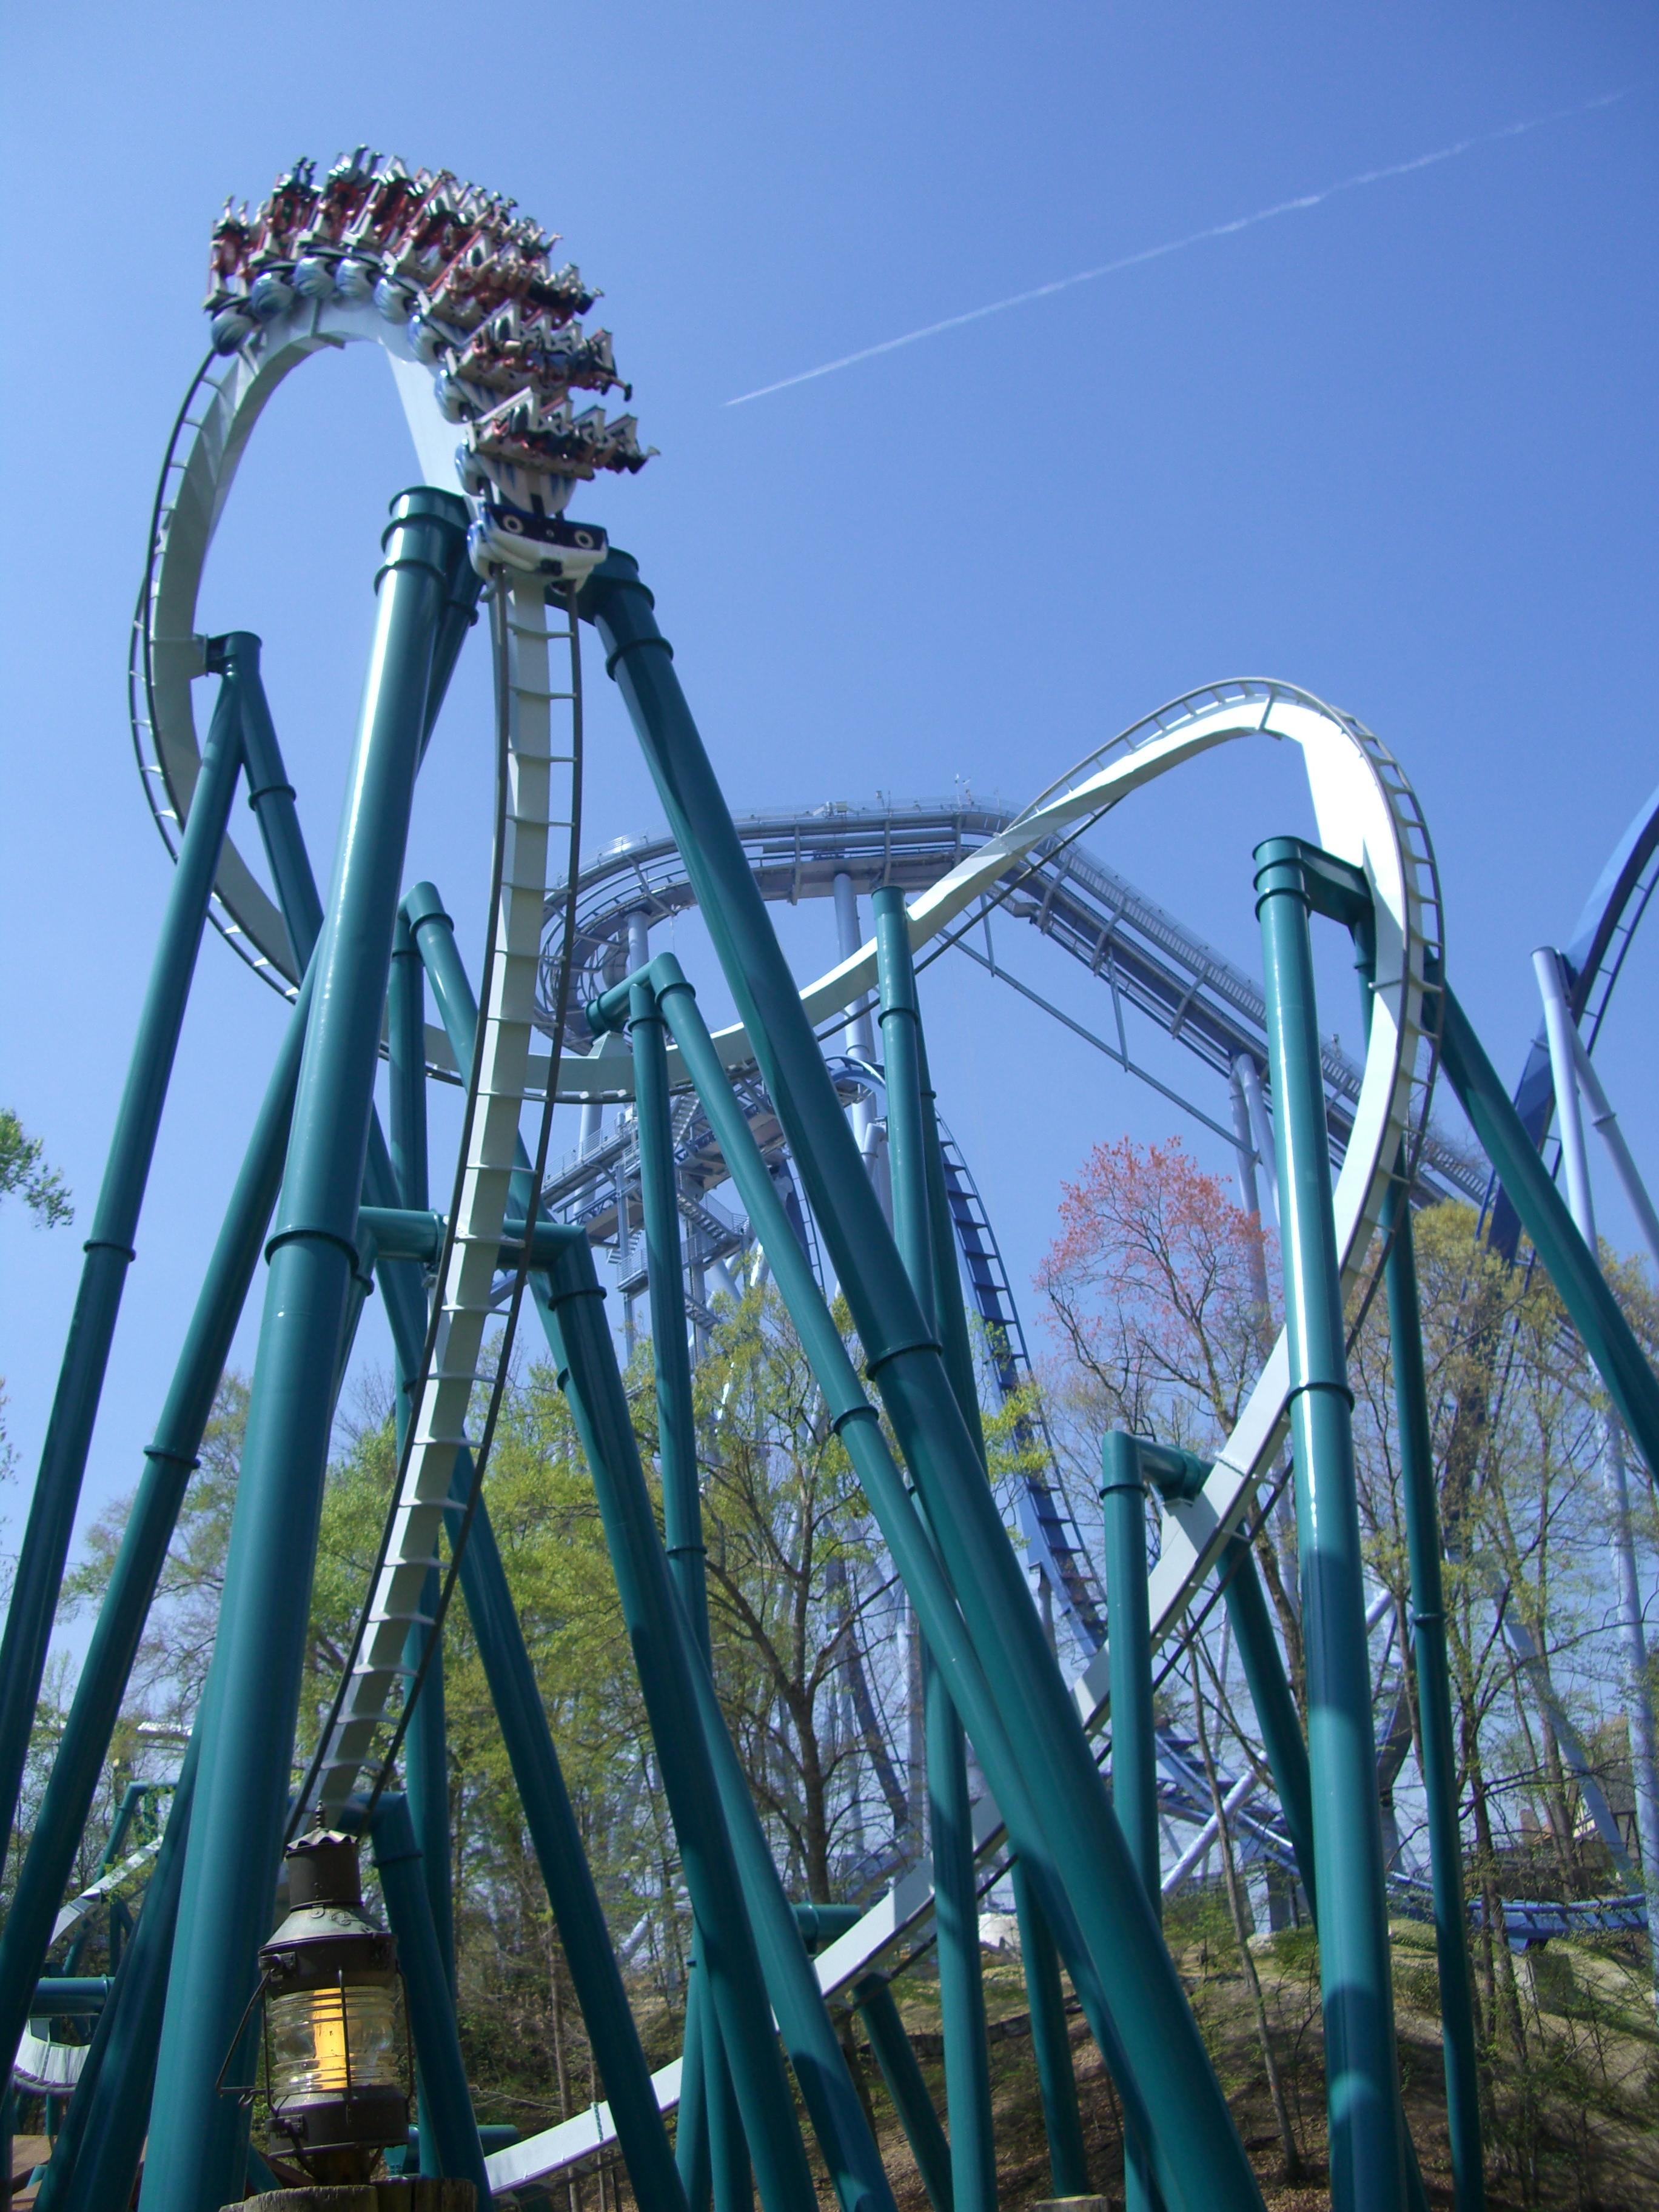 Rollers alpengeist roller coaster for New rollercoaster at busch gardens